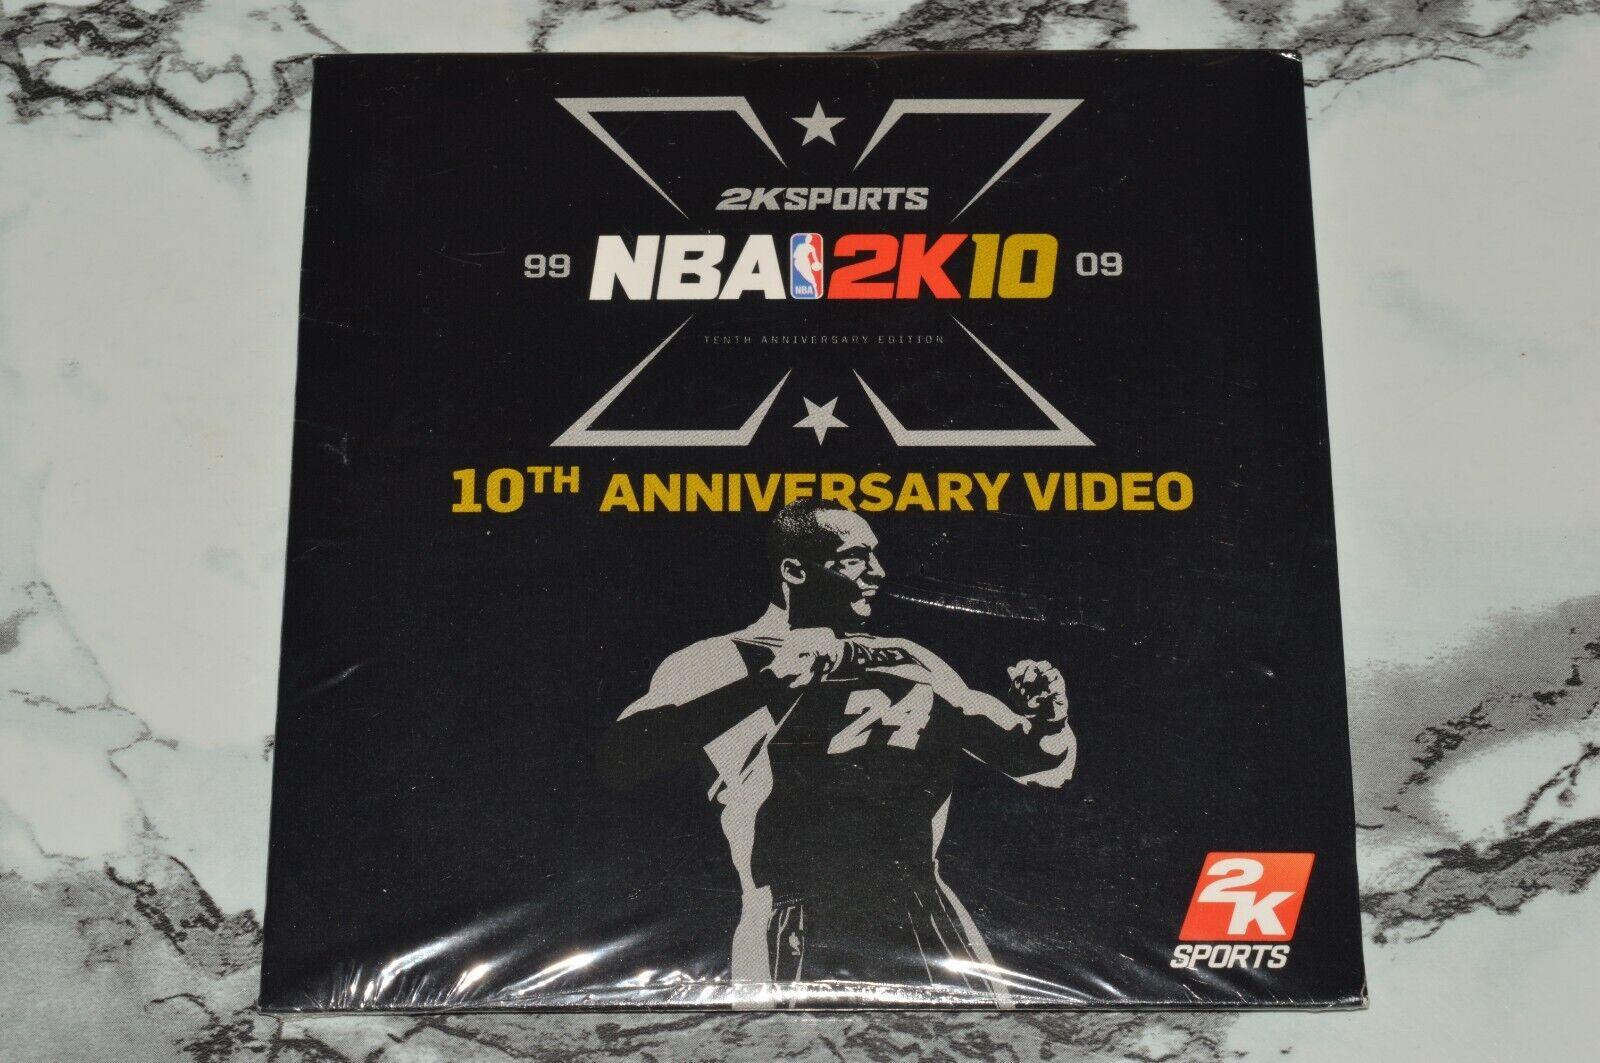 NEW - 2K Sports - NBA 2K10 - 10th Anniversary Video PC Game  - $11.93